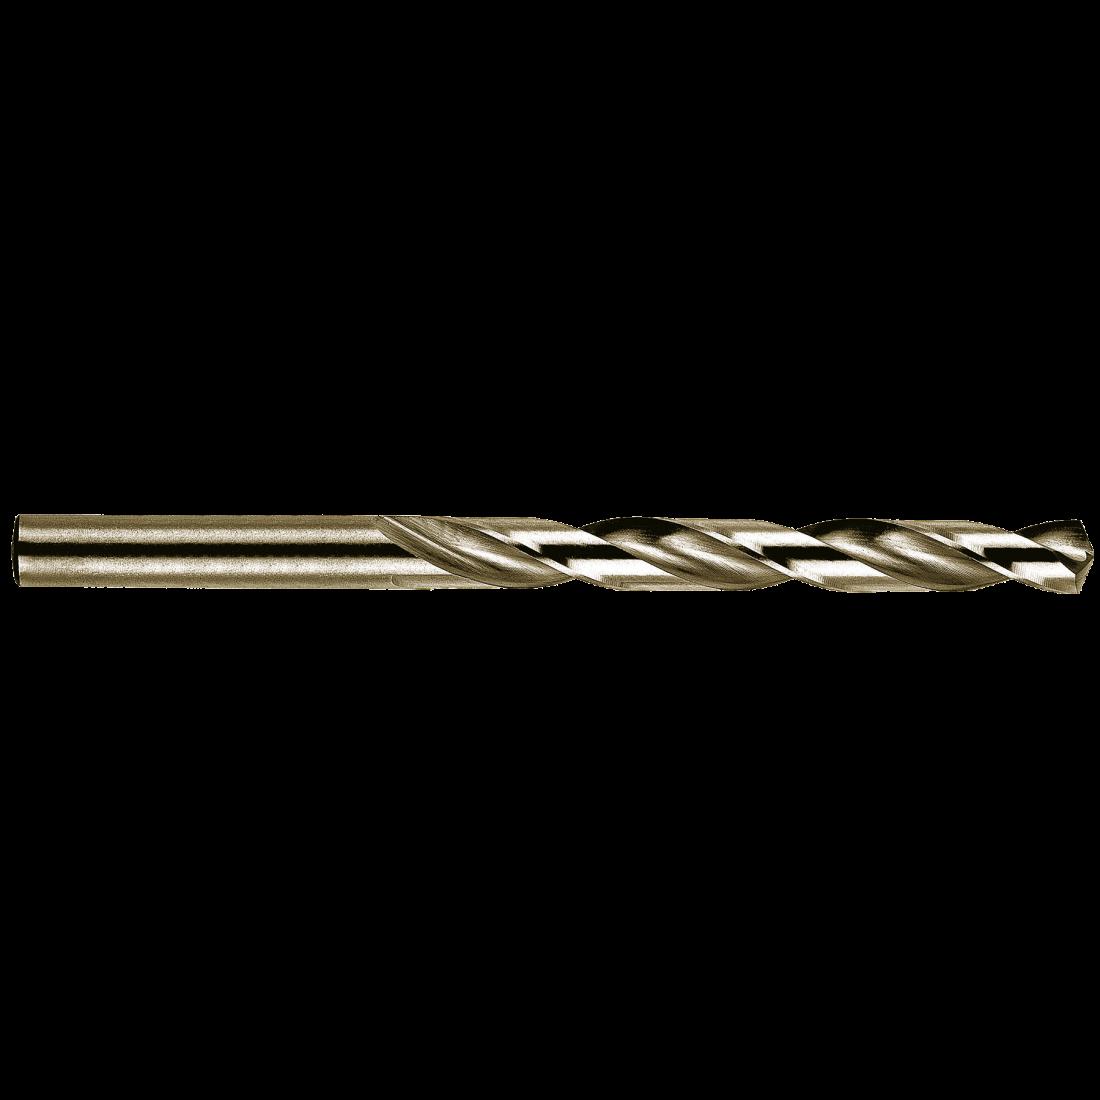 Сверло по металлу Heller НSS-Co DIN 338 RN  3,2x36x65мм (10шт)